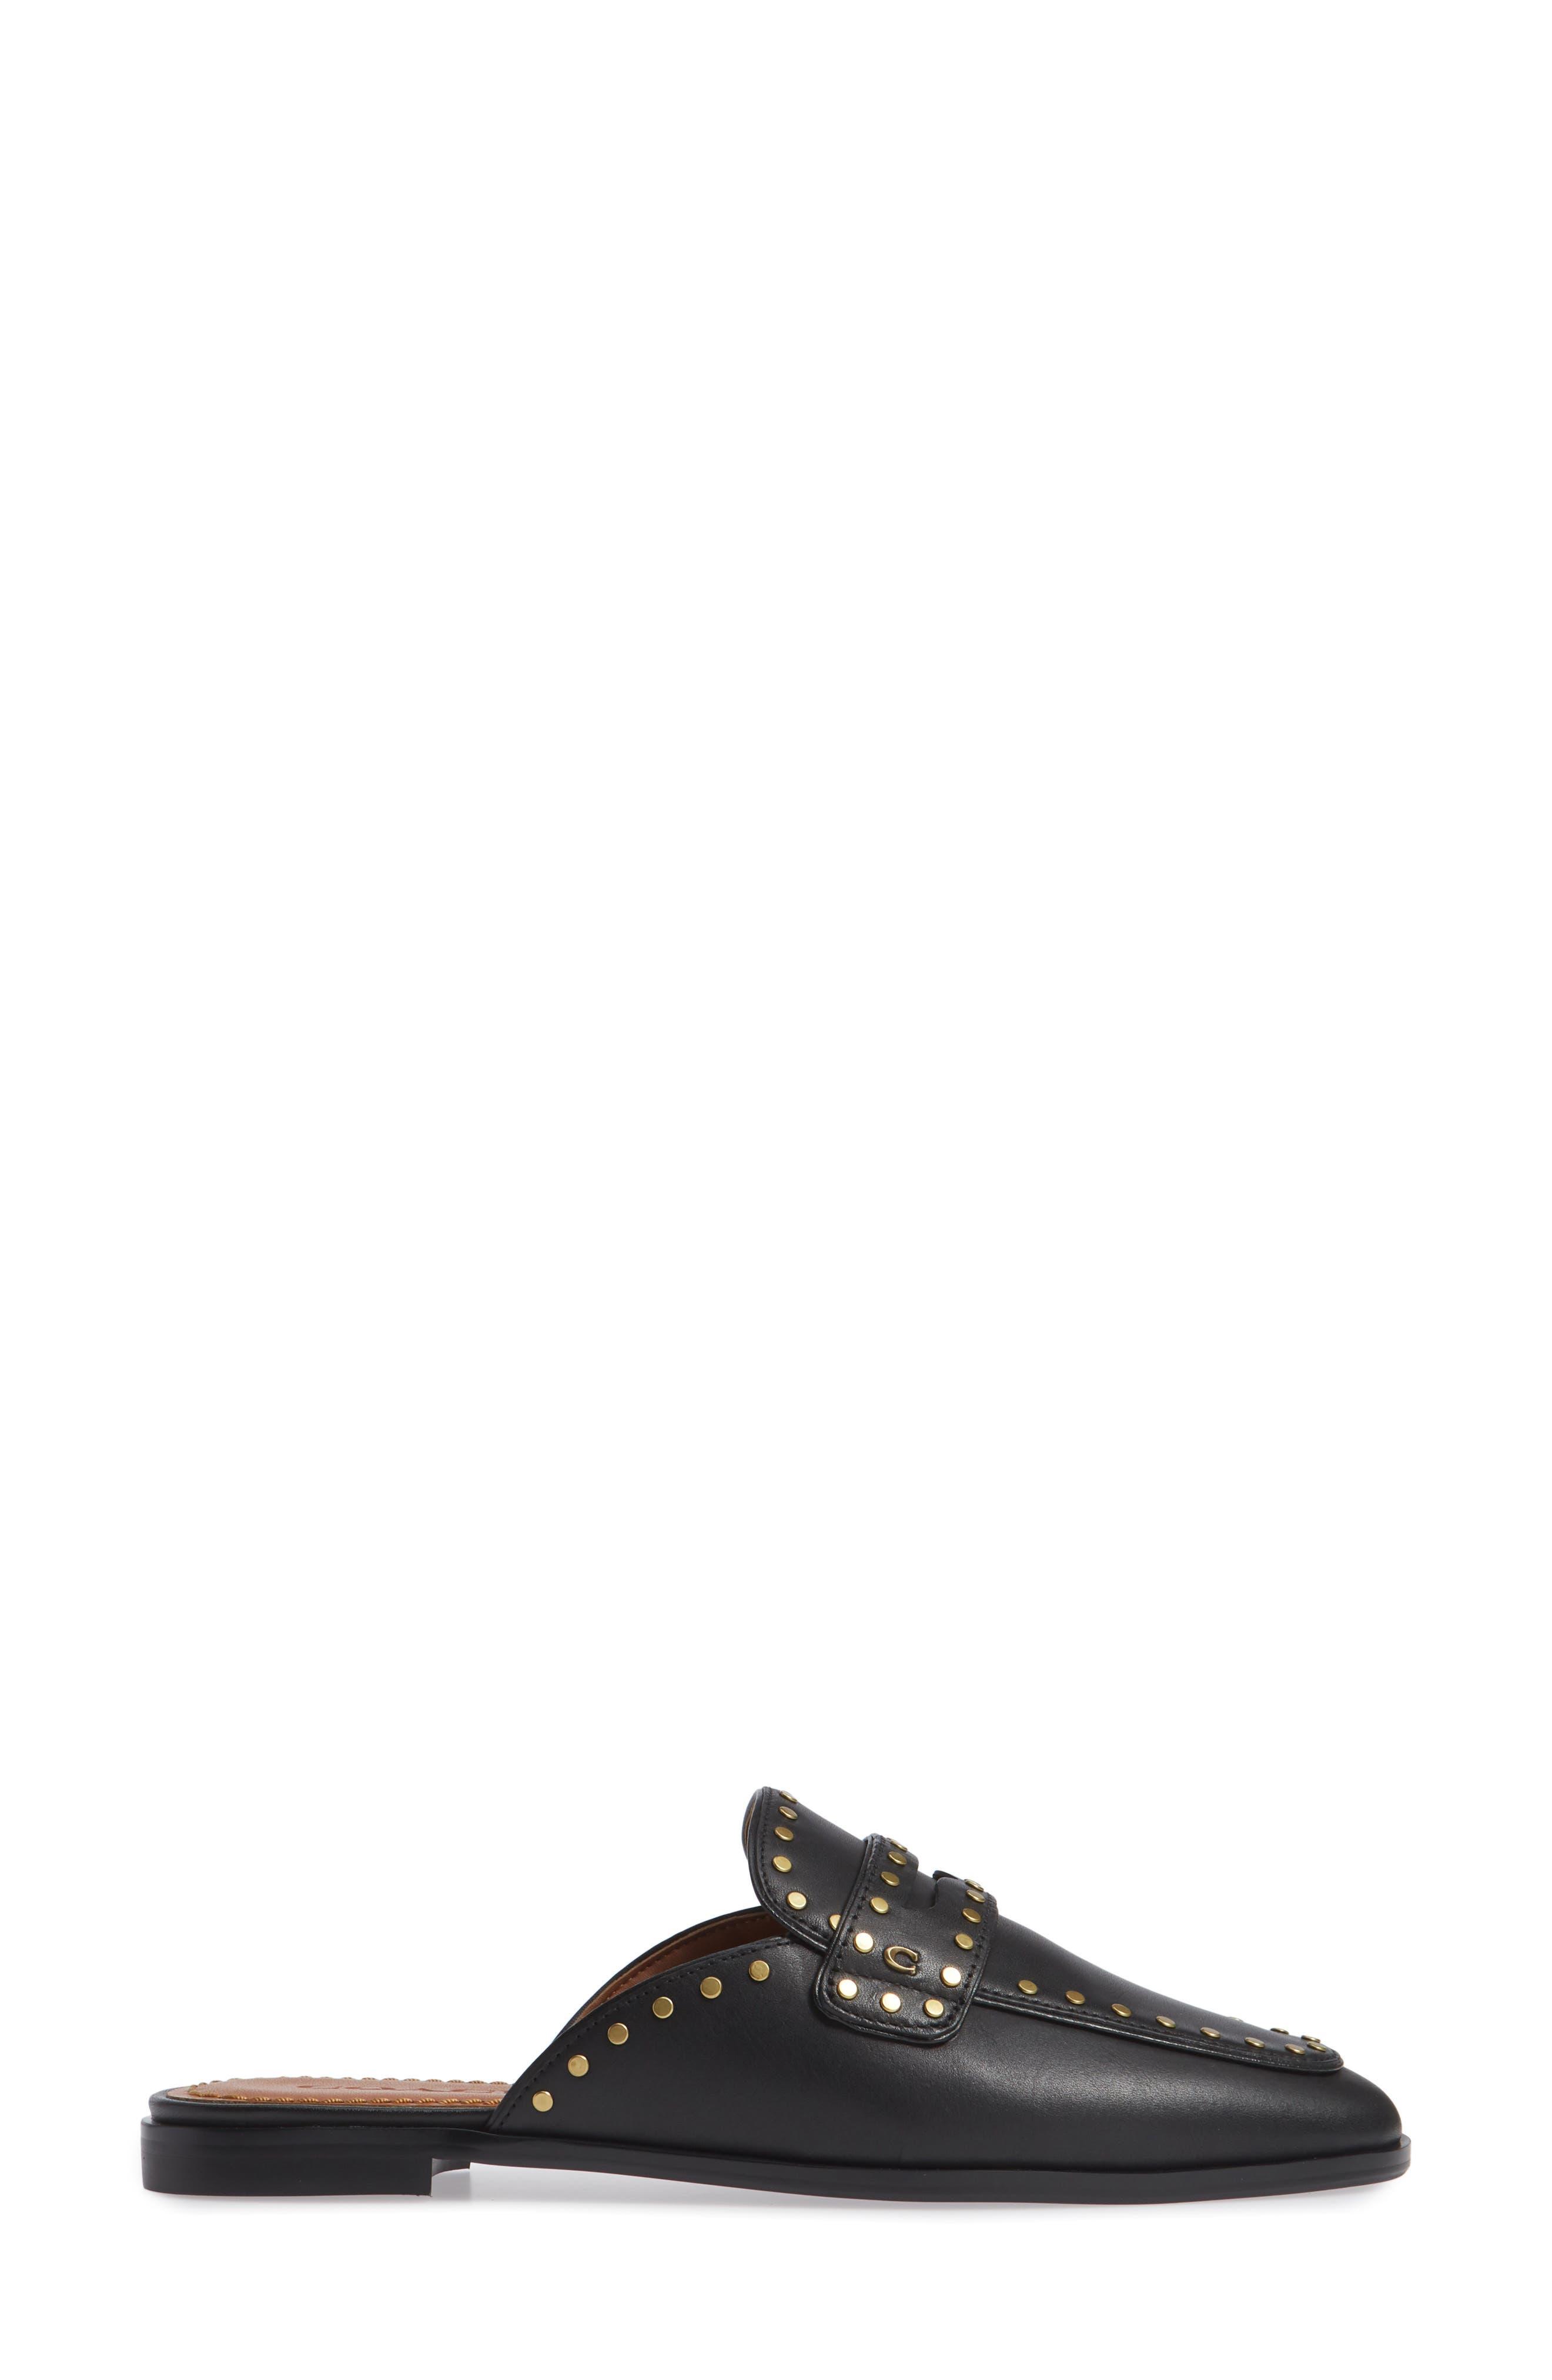 Fiona Loafer Mule,                             Alternate thumbnail 3, color,                             Black Elather